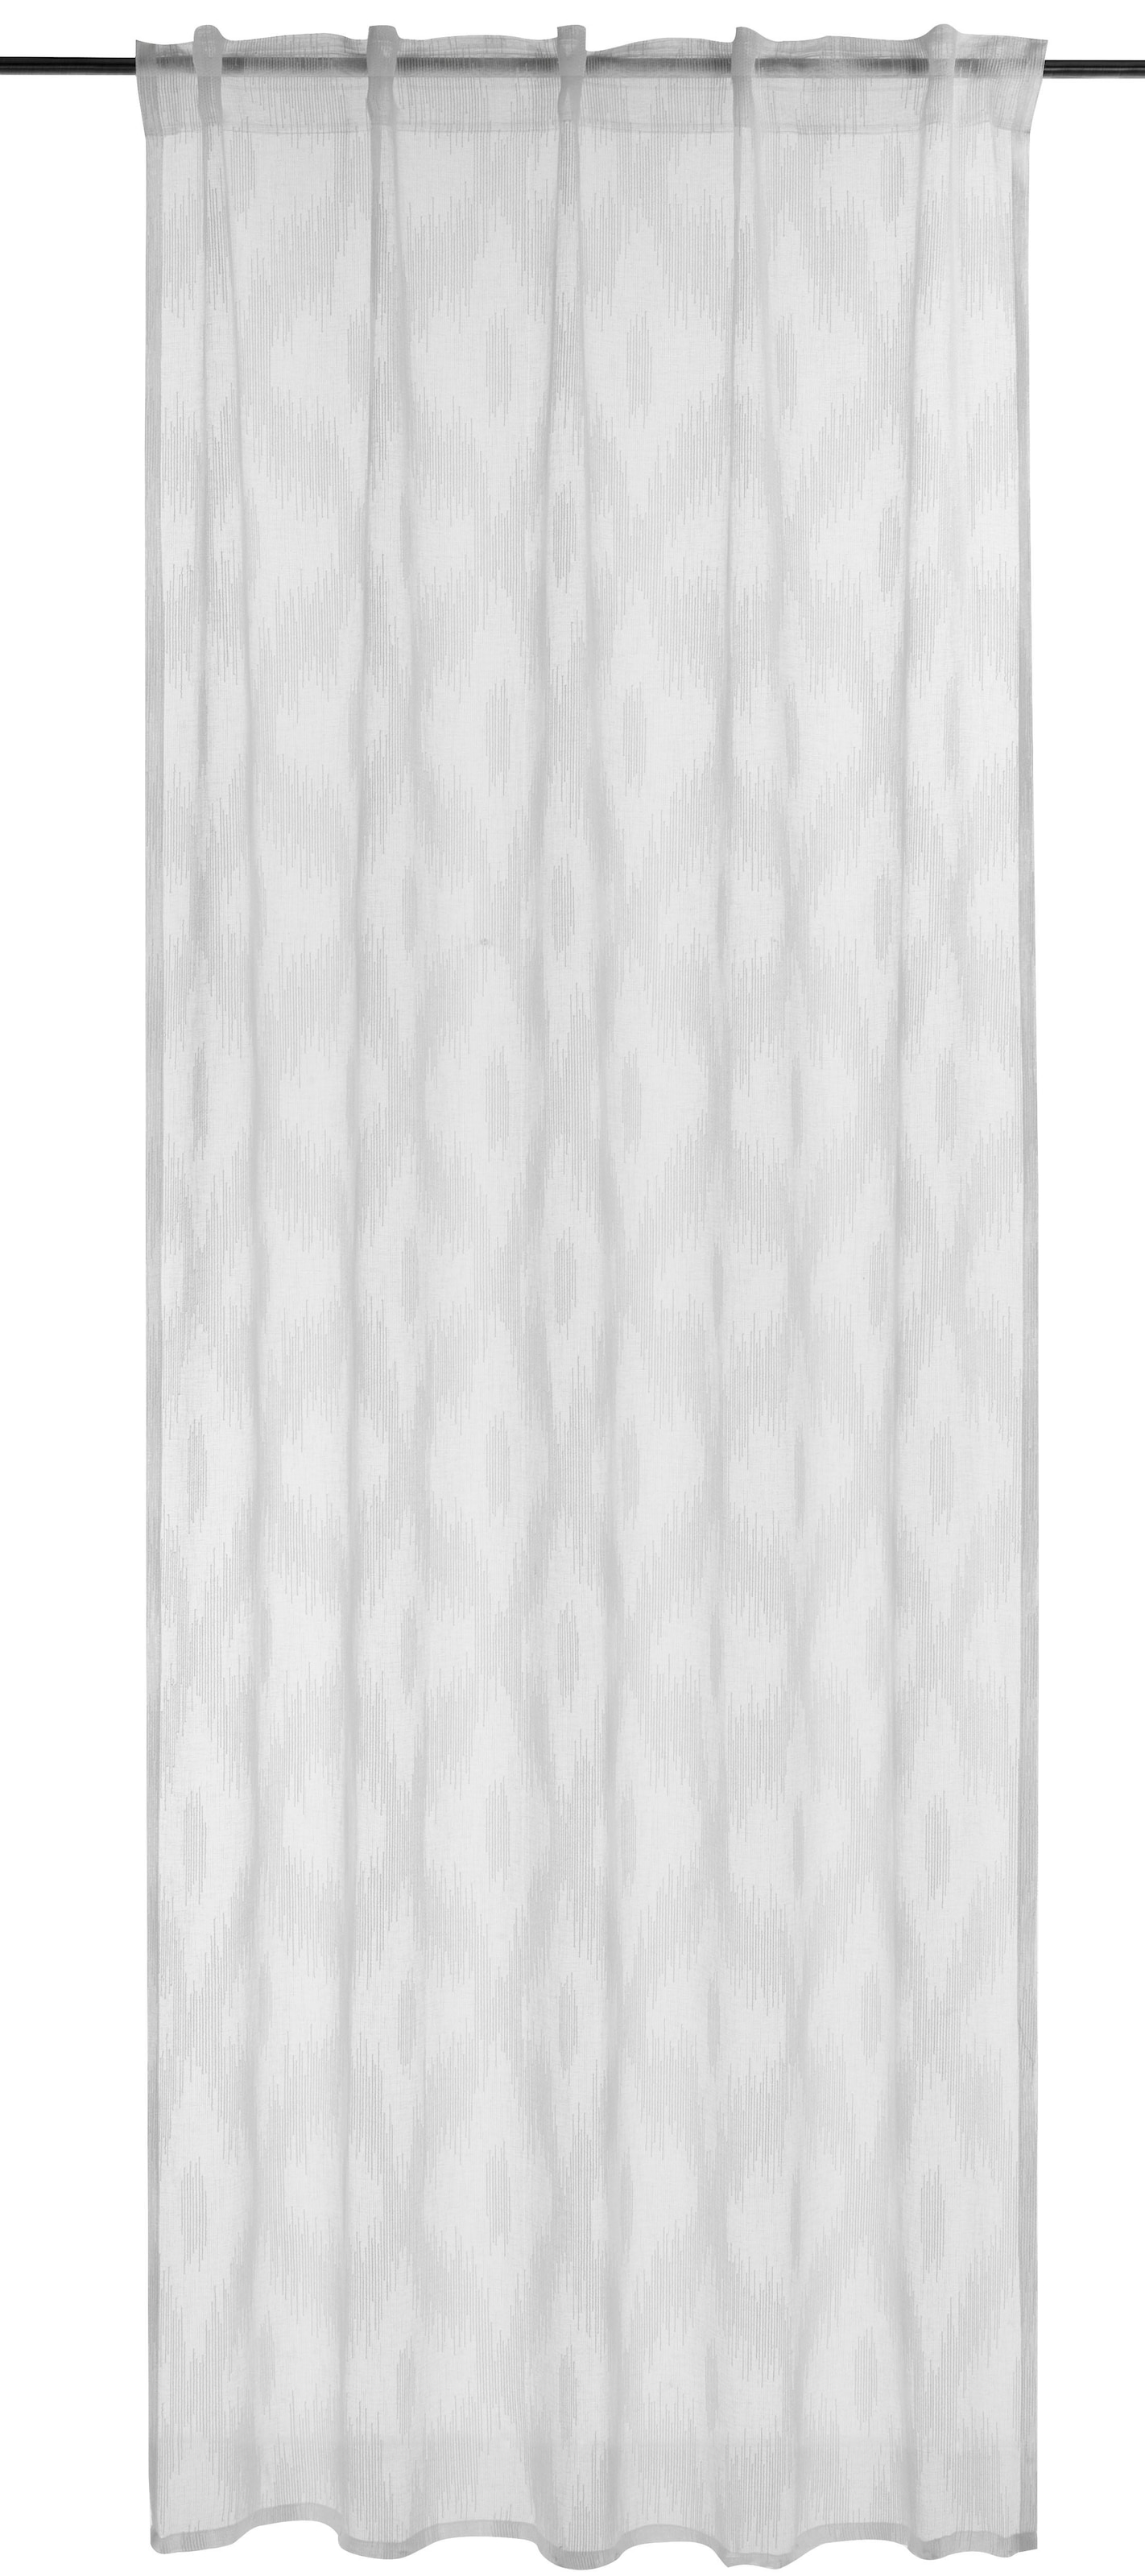 Image of Gardine, »FD Rhombus«, BARBARA Home Collection, Multifunktionsband 1 Stück